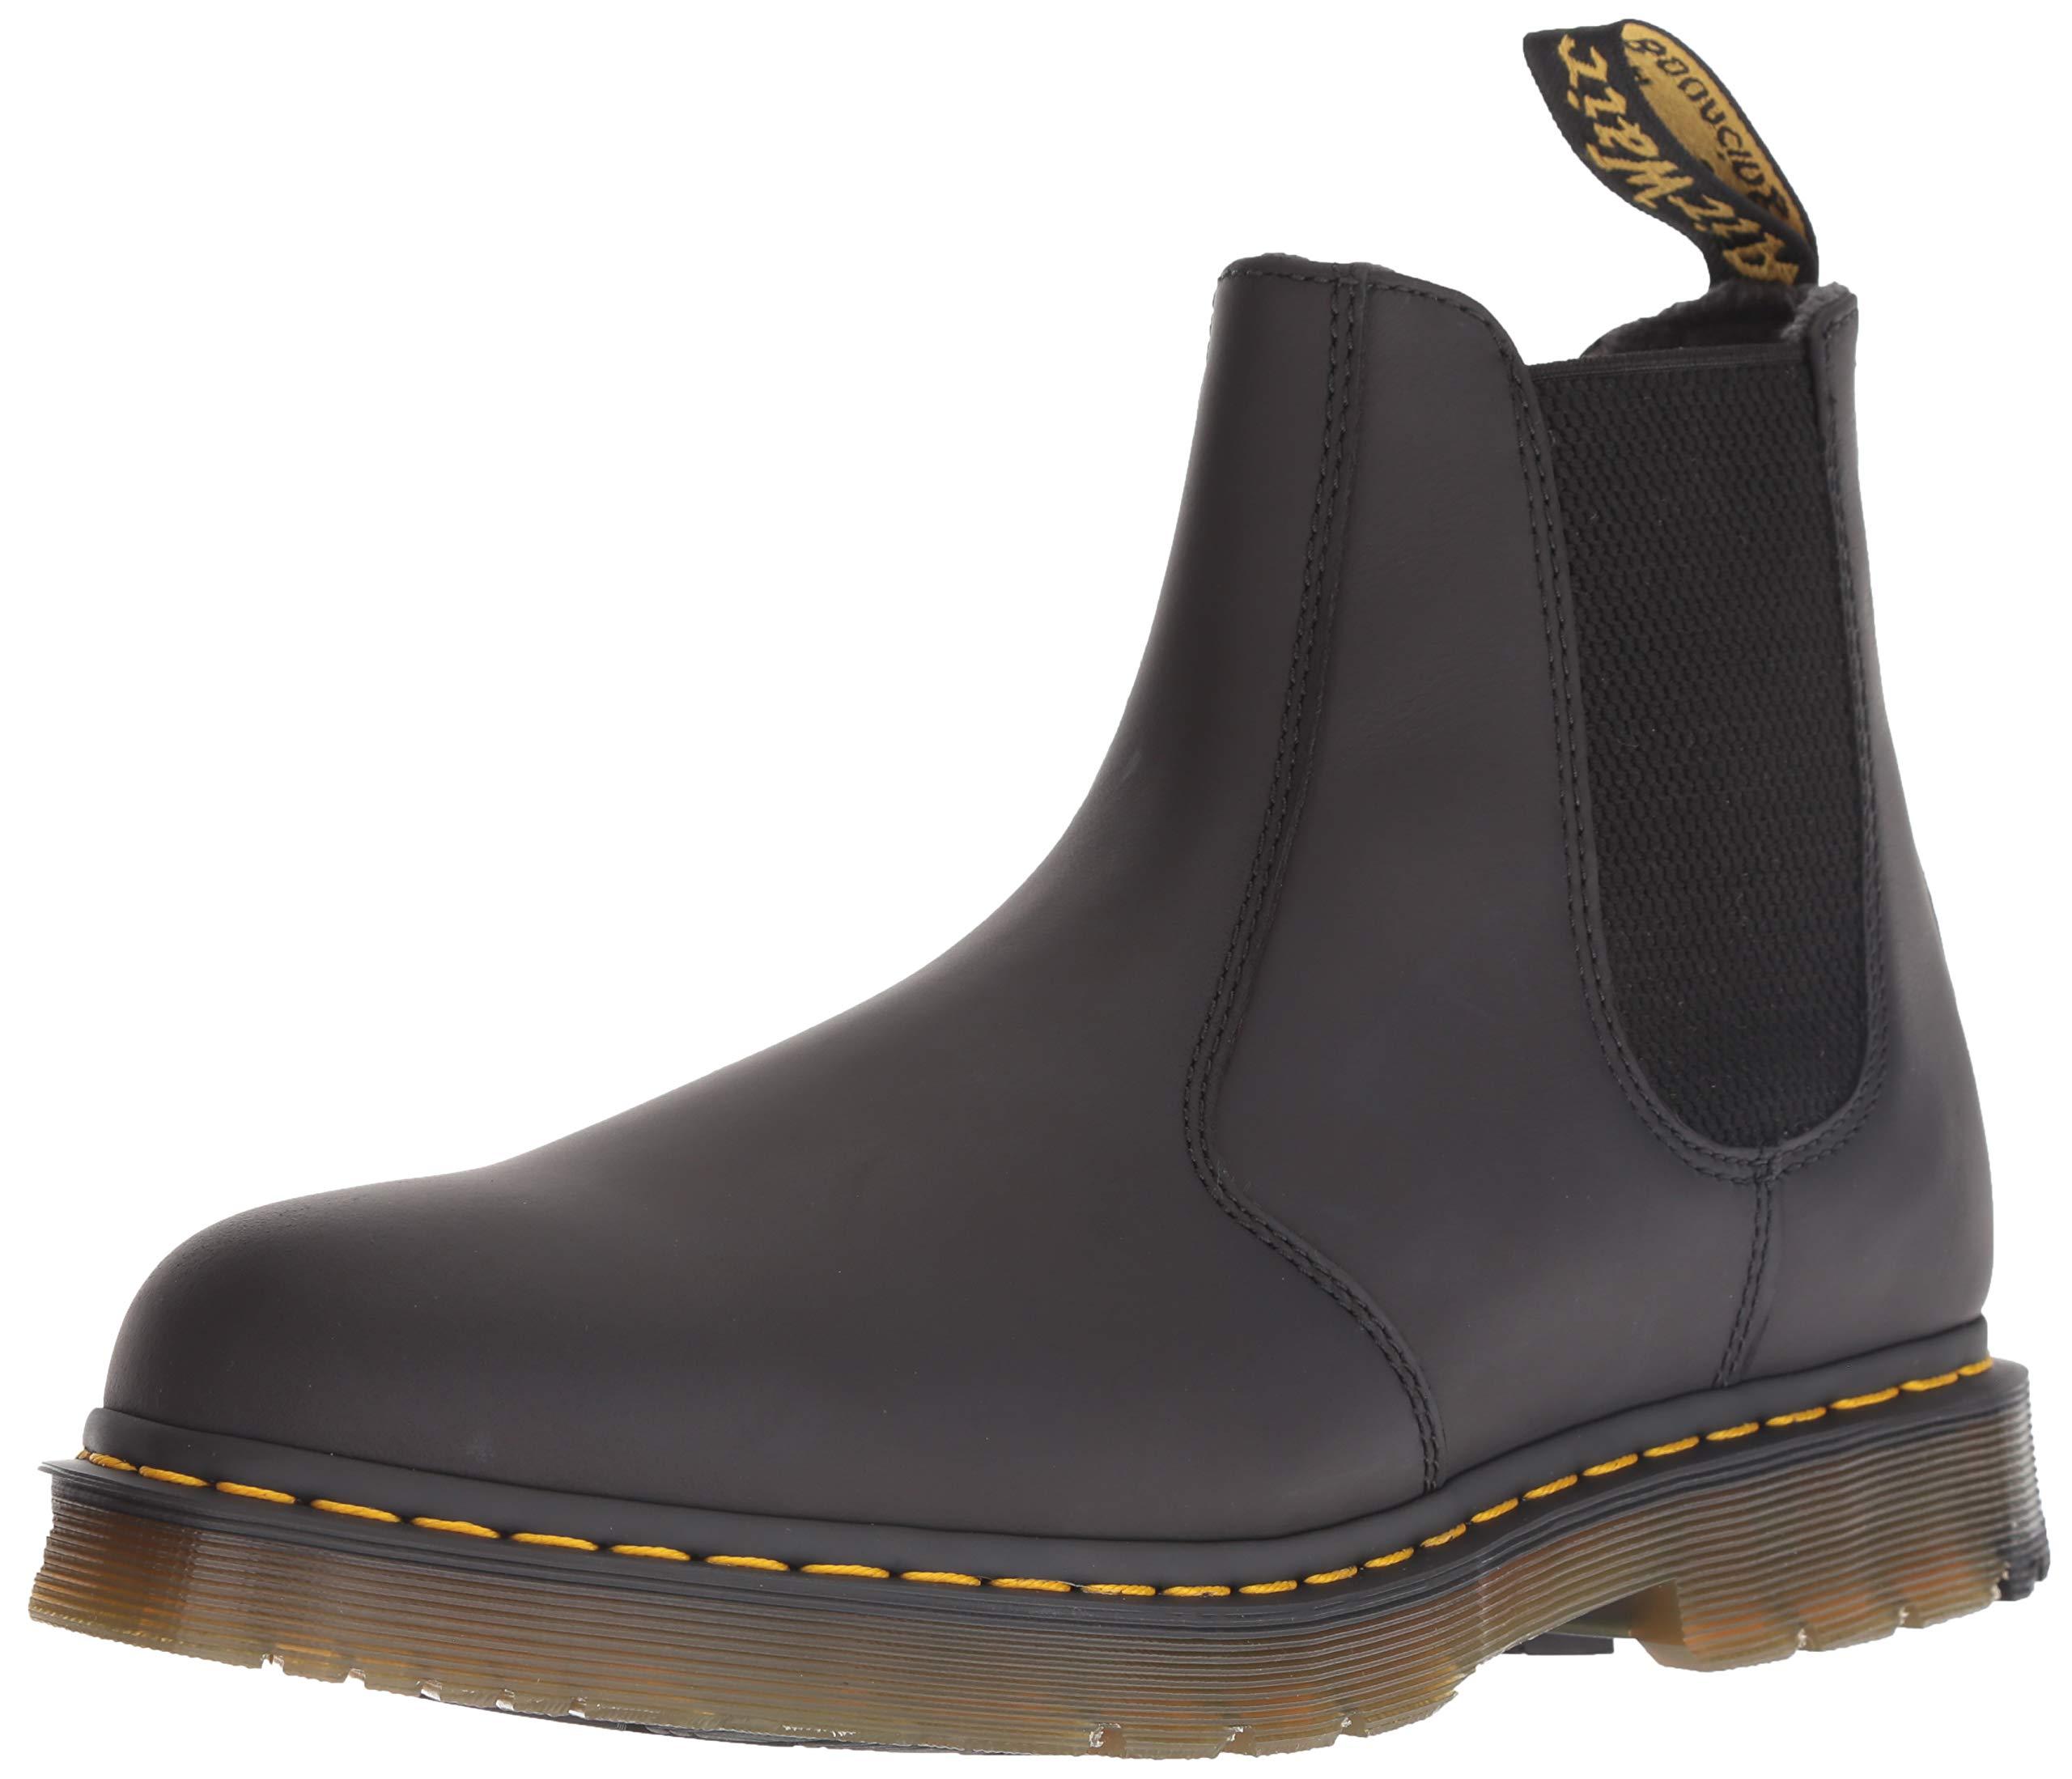 Dr. Martens Men's 2976 Snow Boot, Black, 6 Medium UK (7 US)